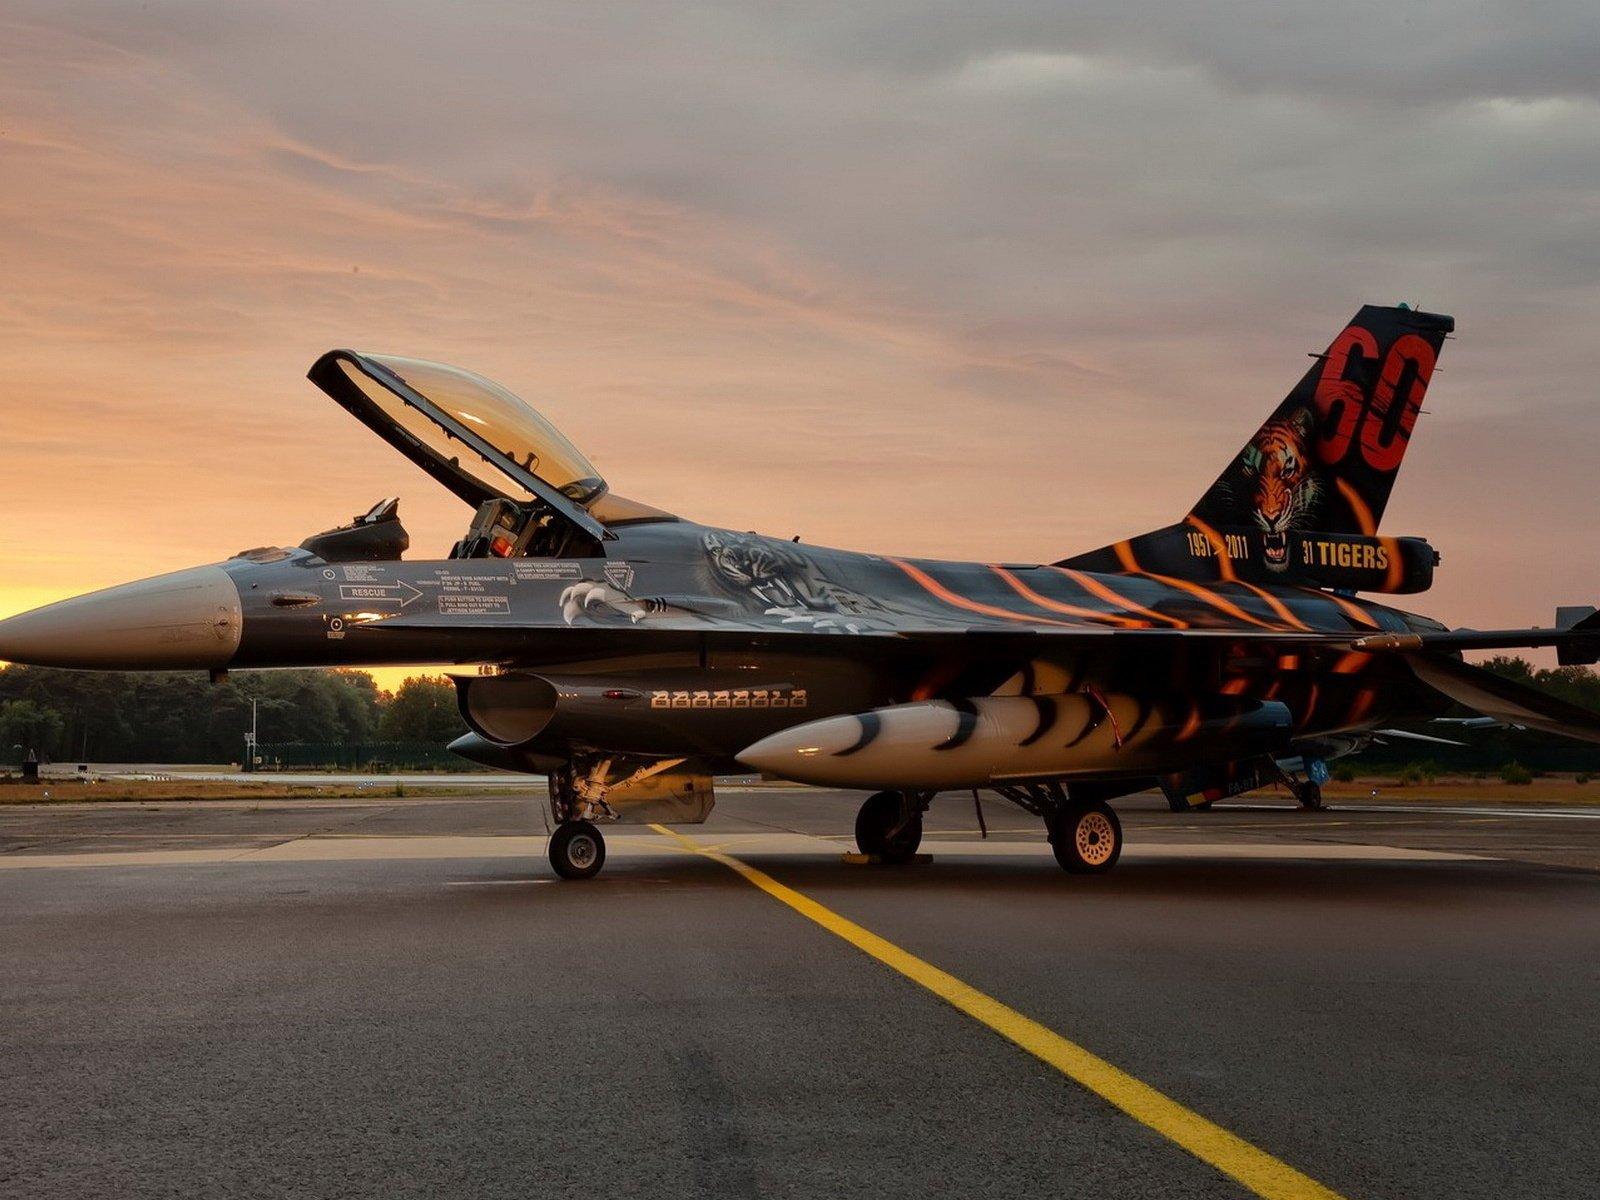 авиация самолет желтый F-16 Fighting Falcon  № 3755541 бесплатно